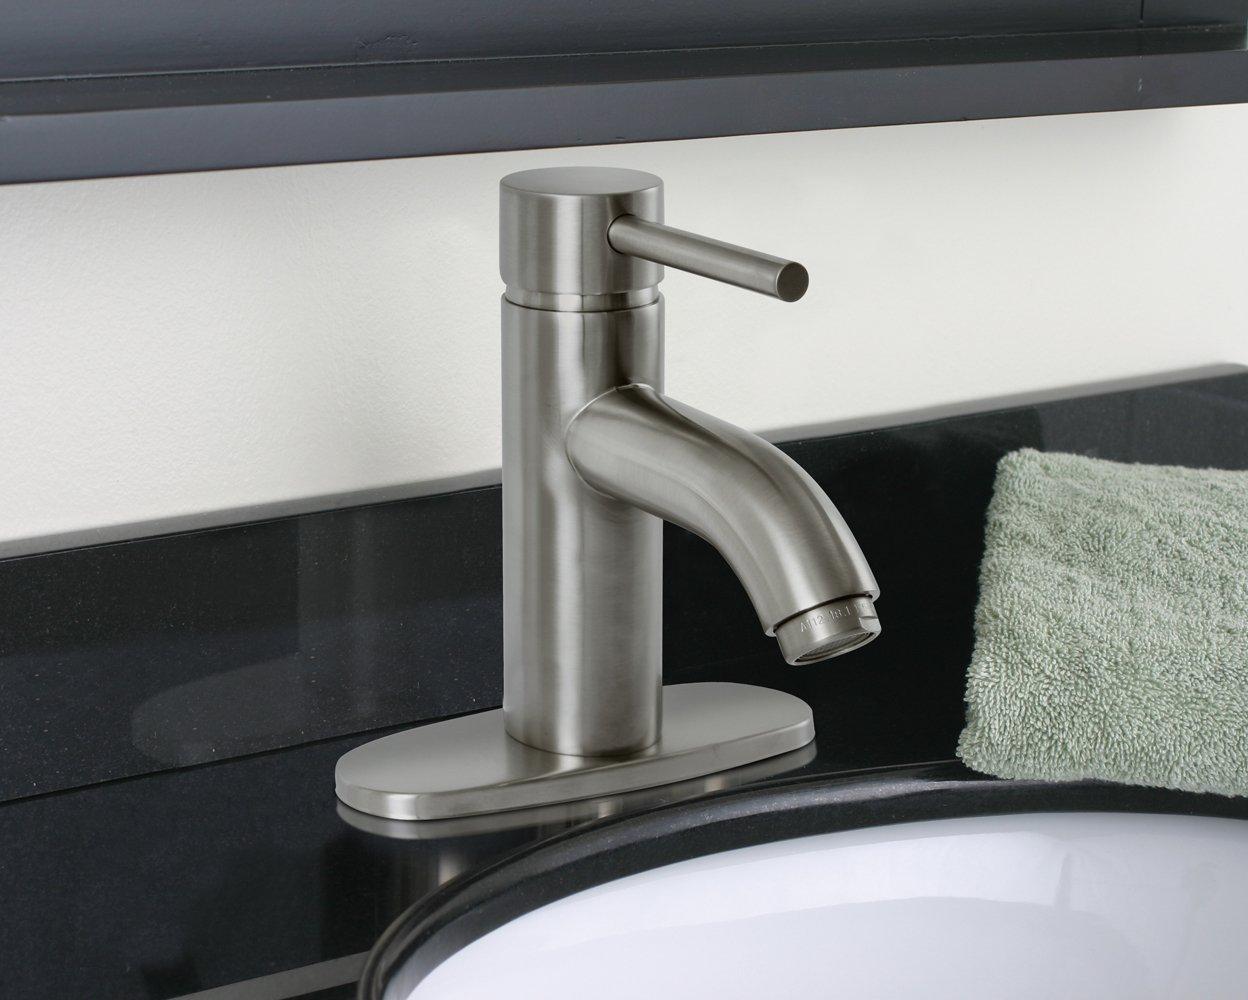 Premier 120122 Essen Single-Handle Lavatory Faucet, Brushed Nickel ...